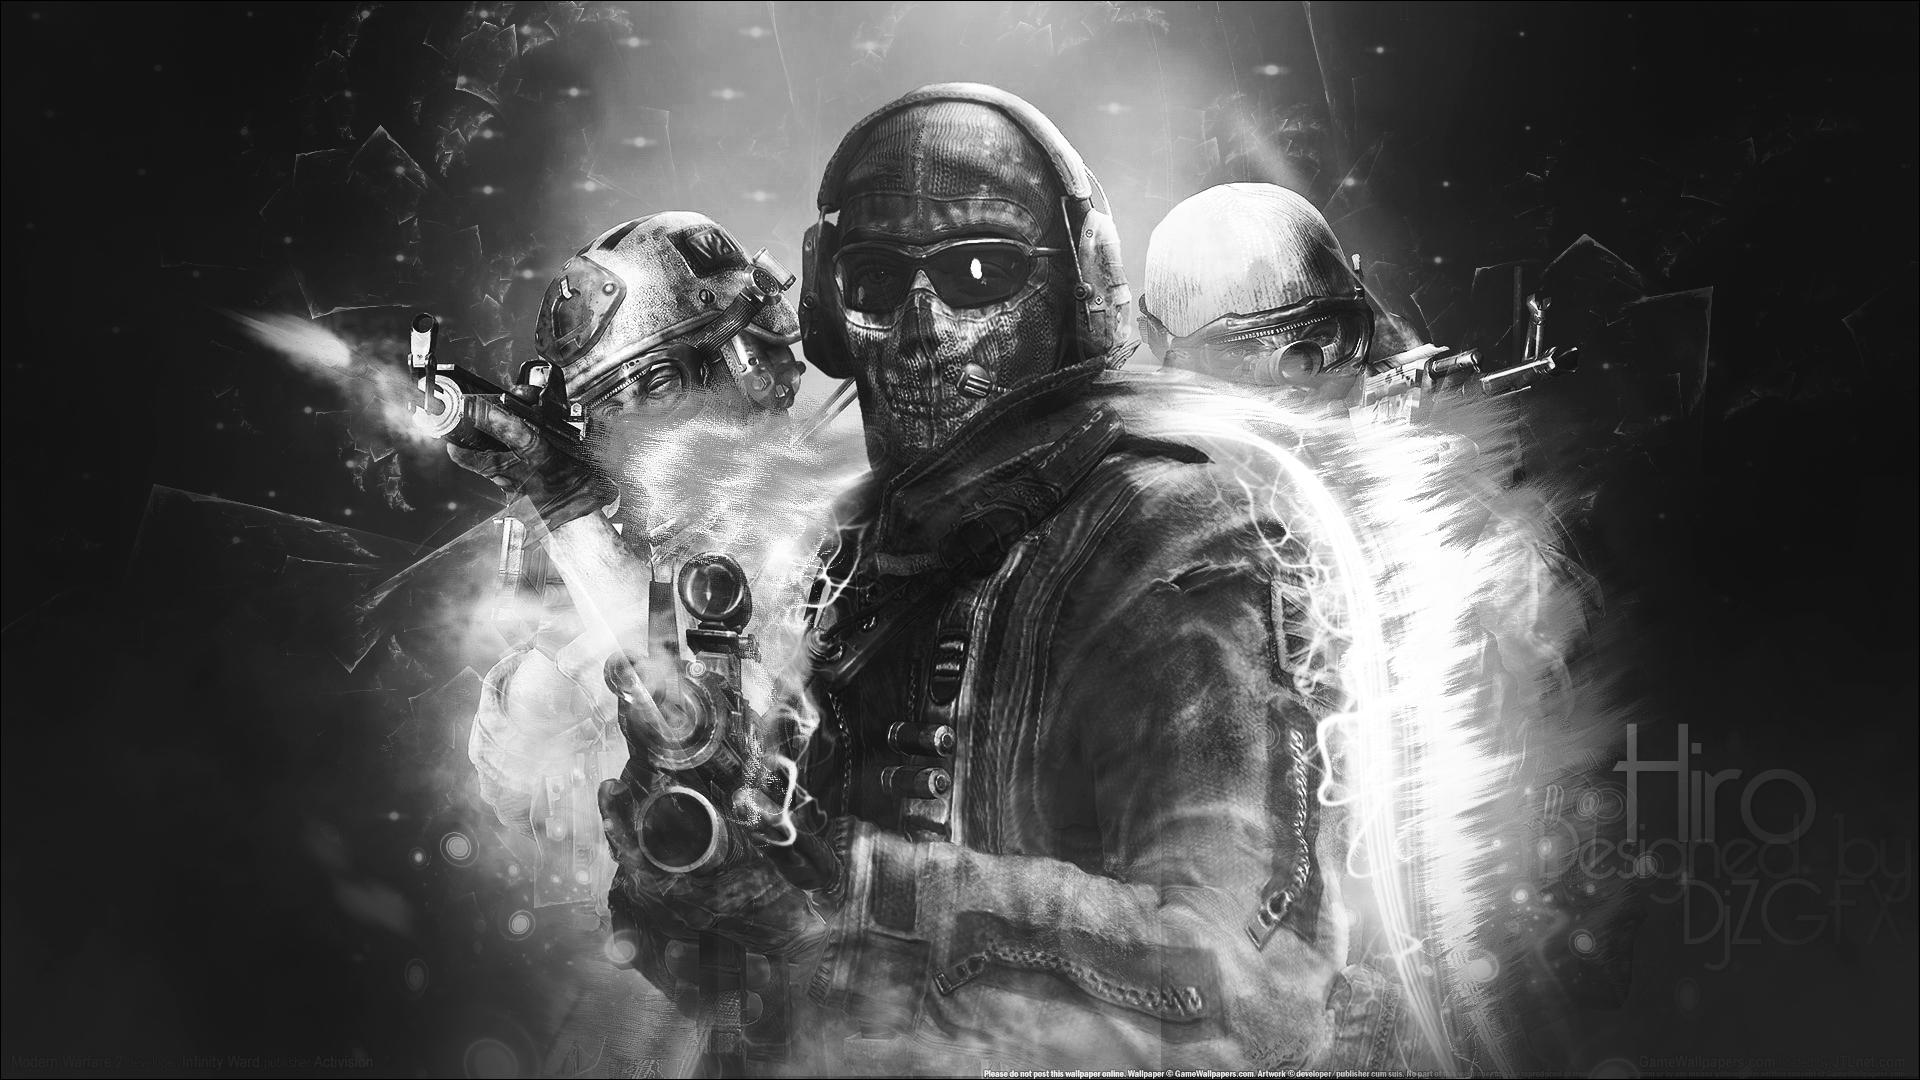 Download Wallpaper 3840x2400 Call Of Duty Modern Warfare 2